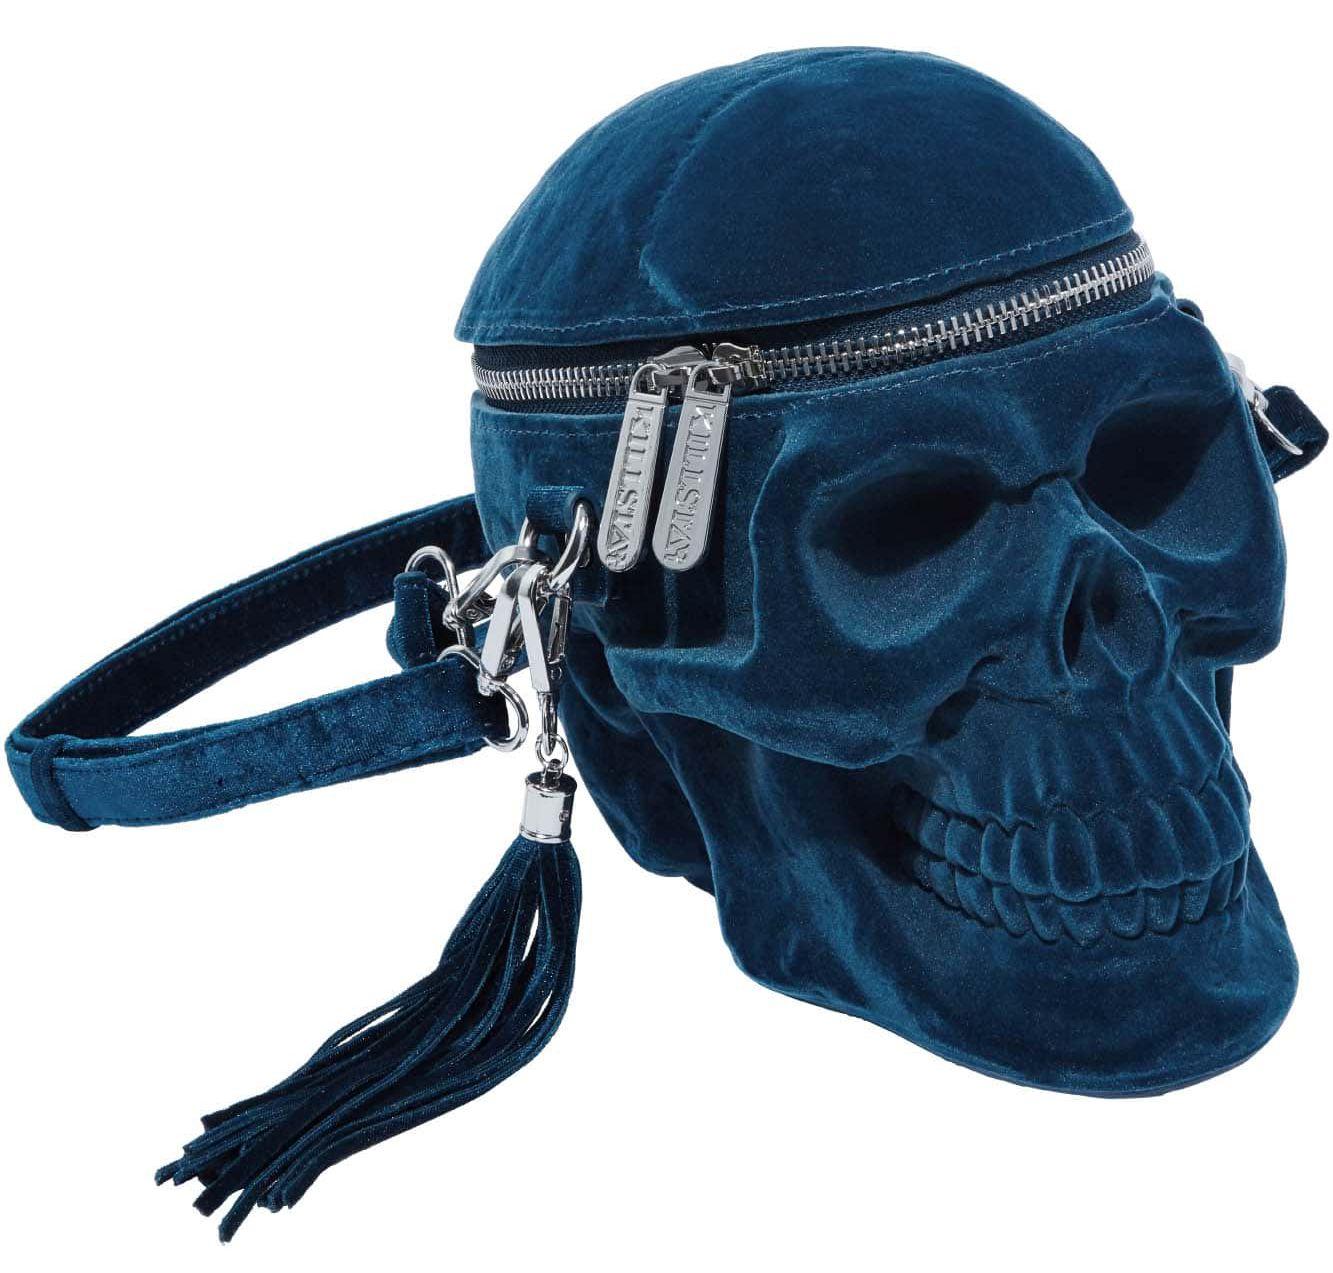 KS03091_sac-a-main-gothique-glam-rock-tete-de-mort-grave-digger-velvet-bleu